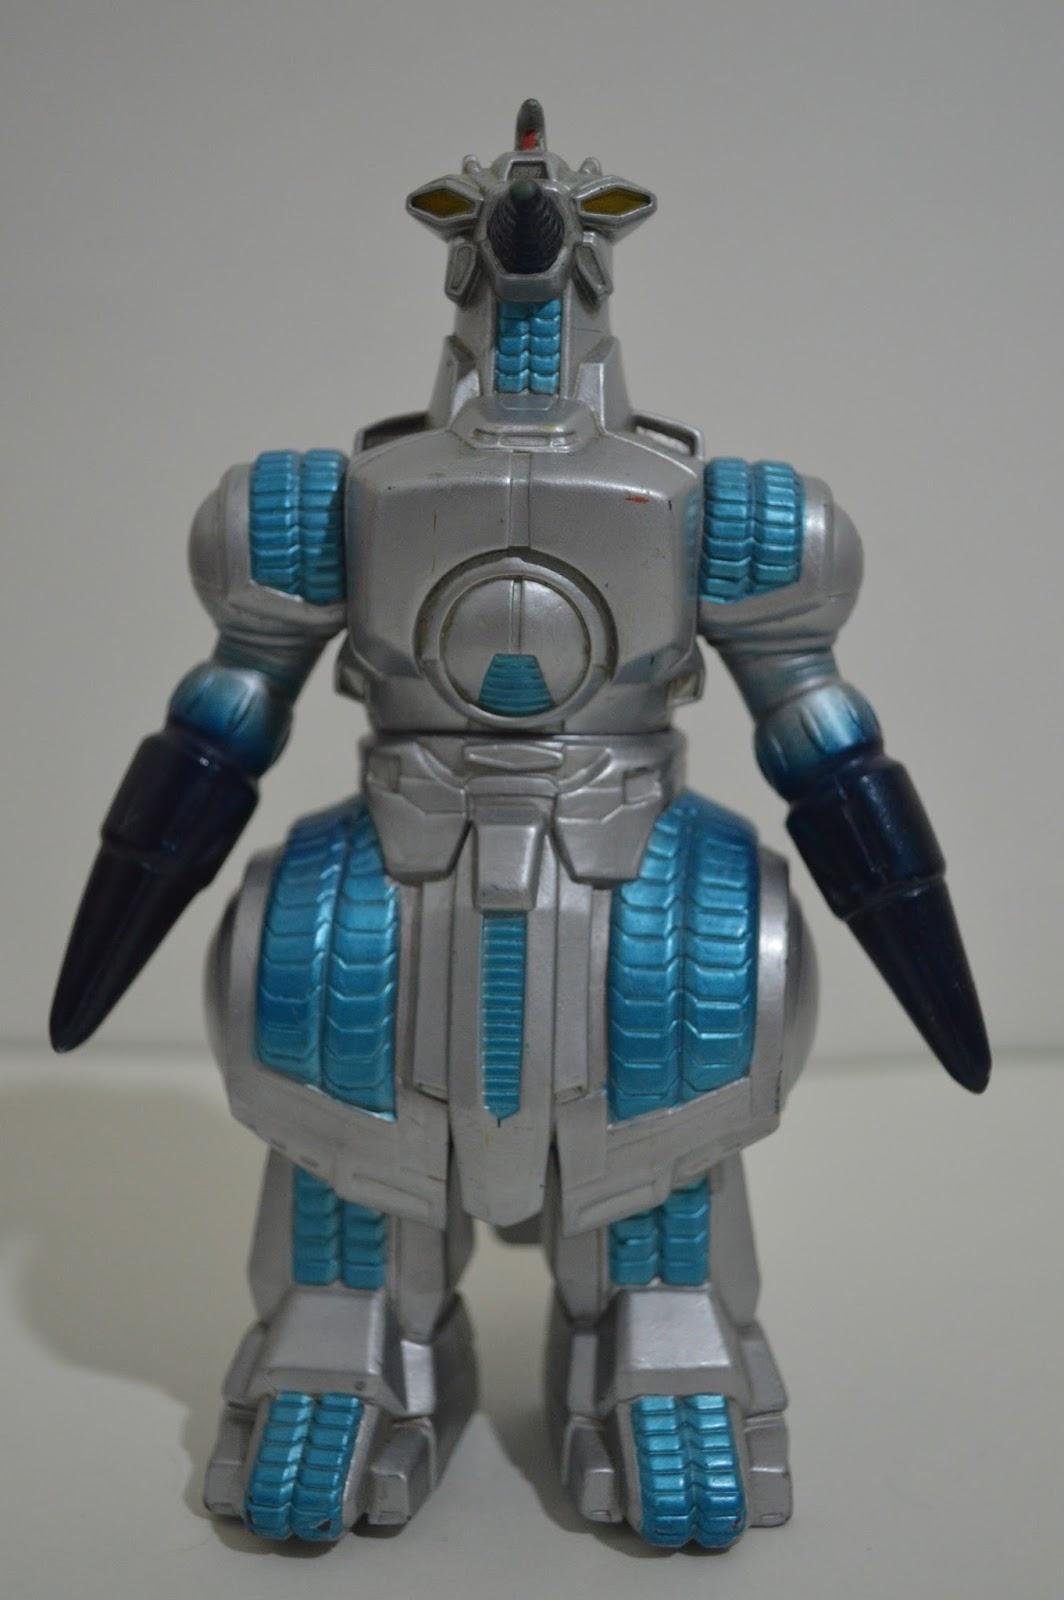 Moguera 1994 Toy